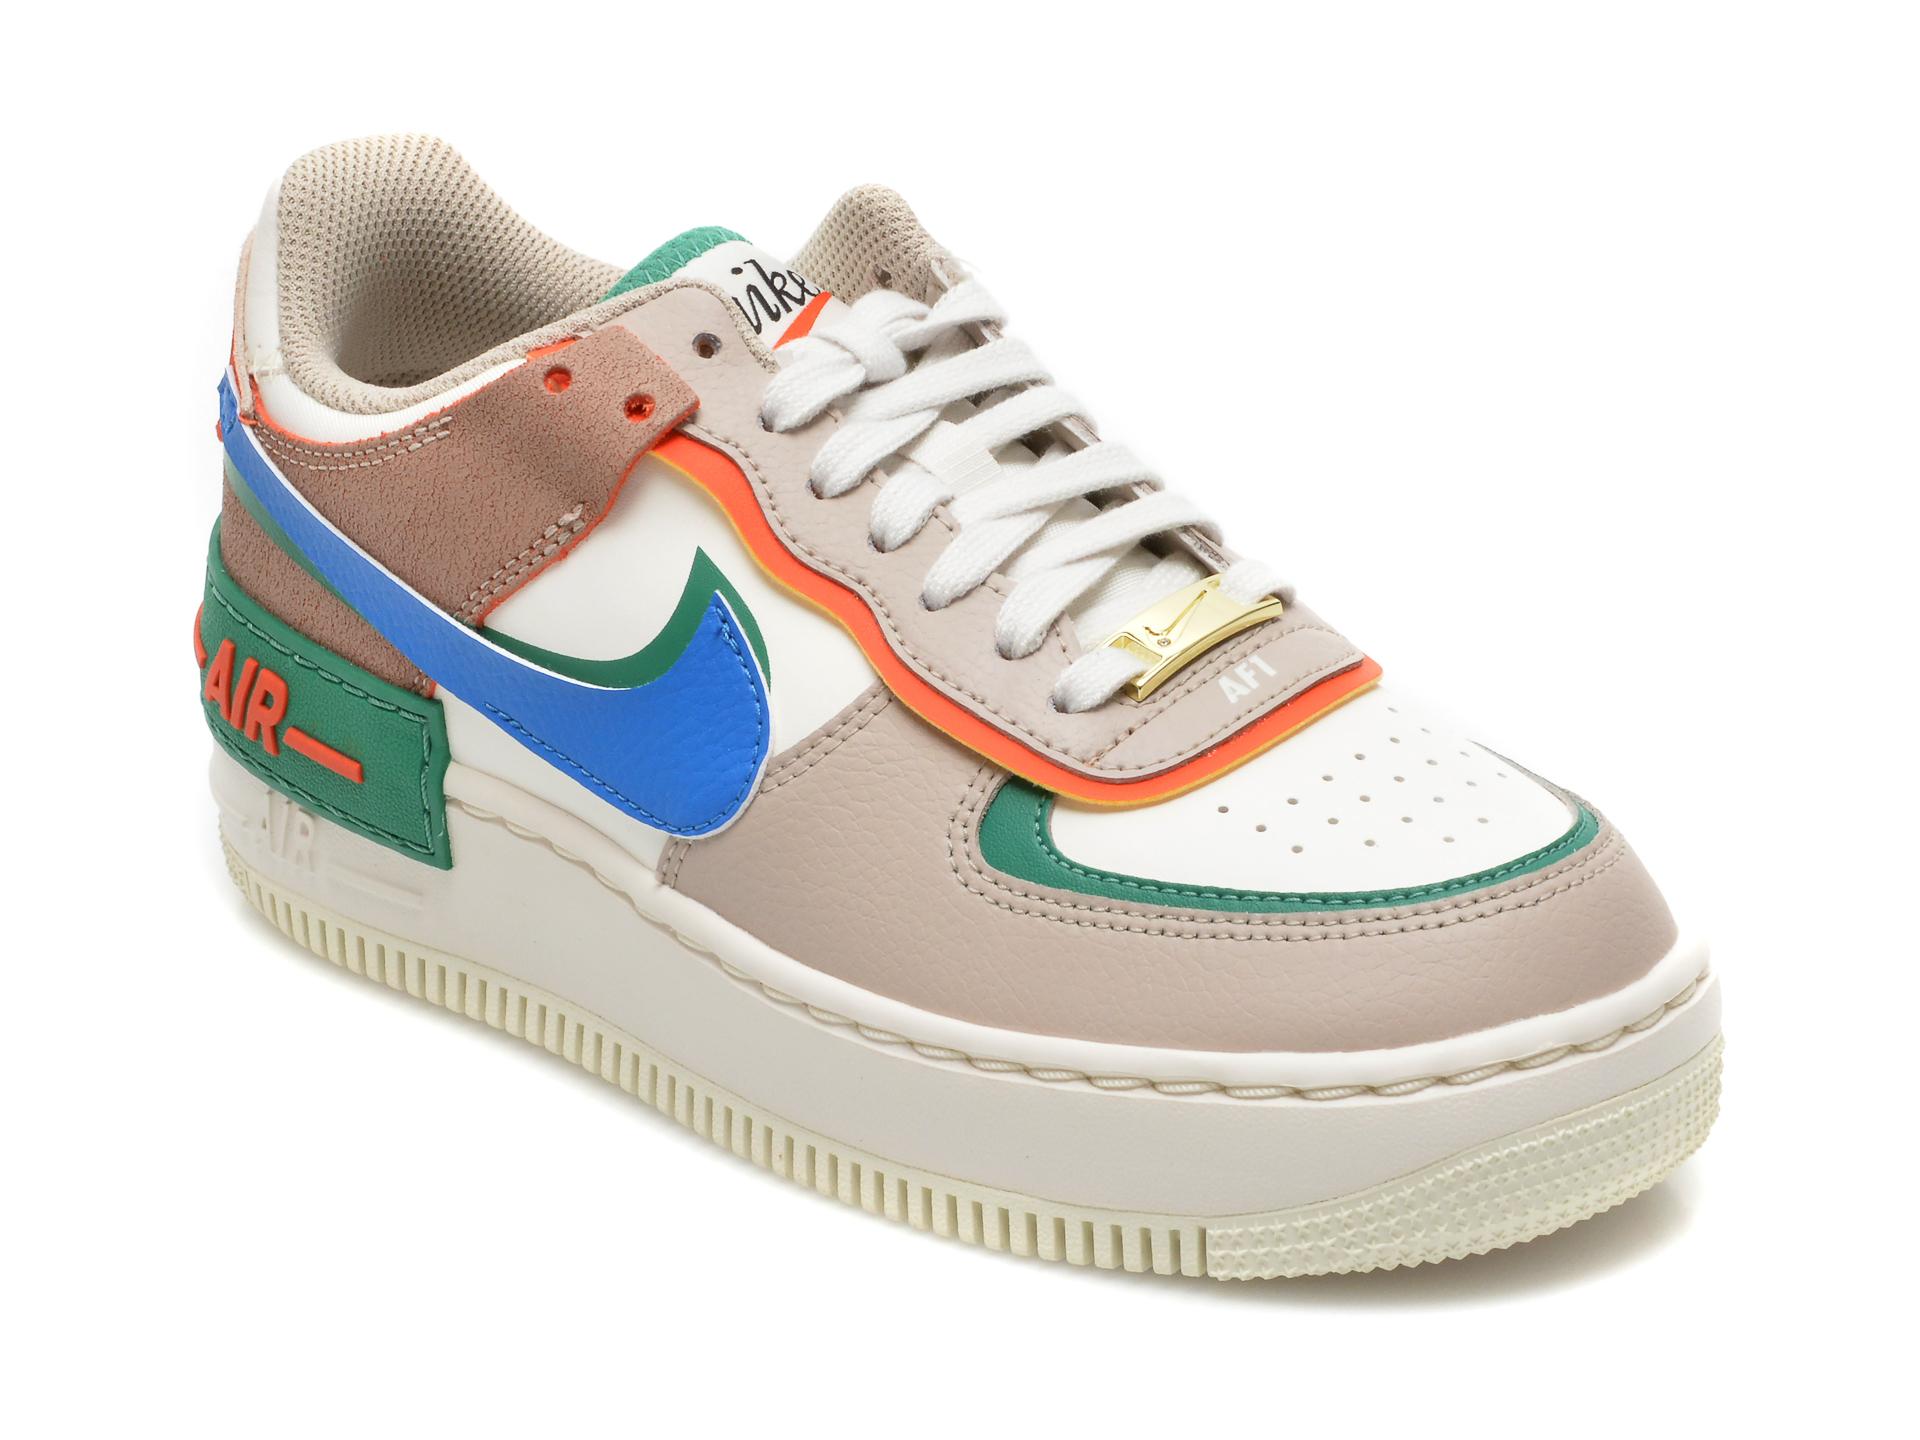 Pantofi Sport Nike Multicolori, W Af1 Shadow, Din Piele Naturala